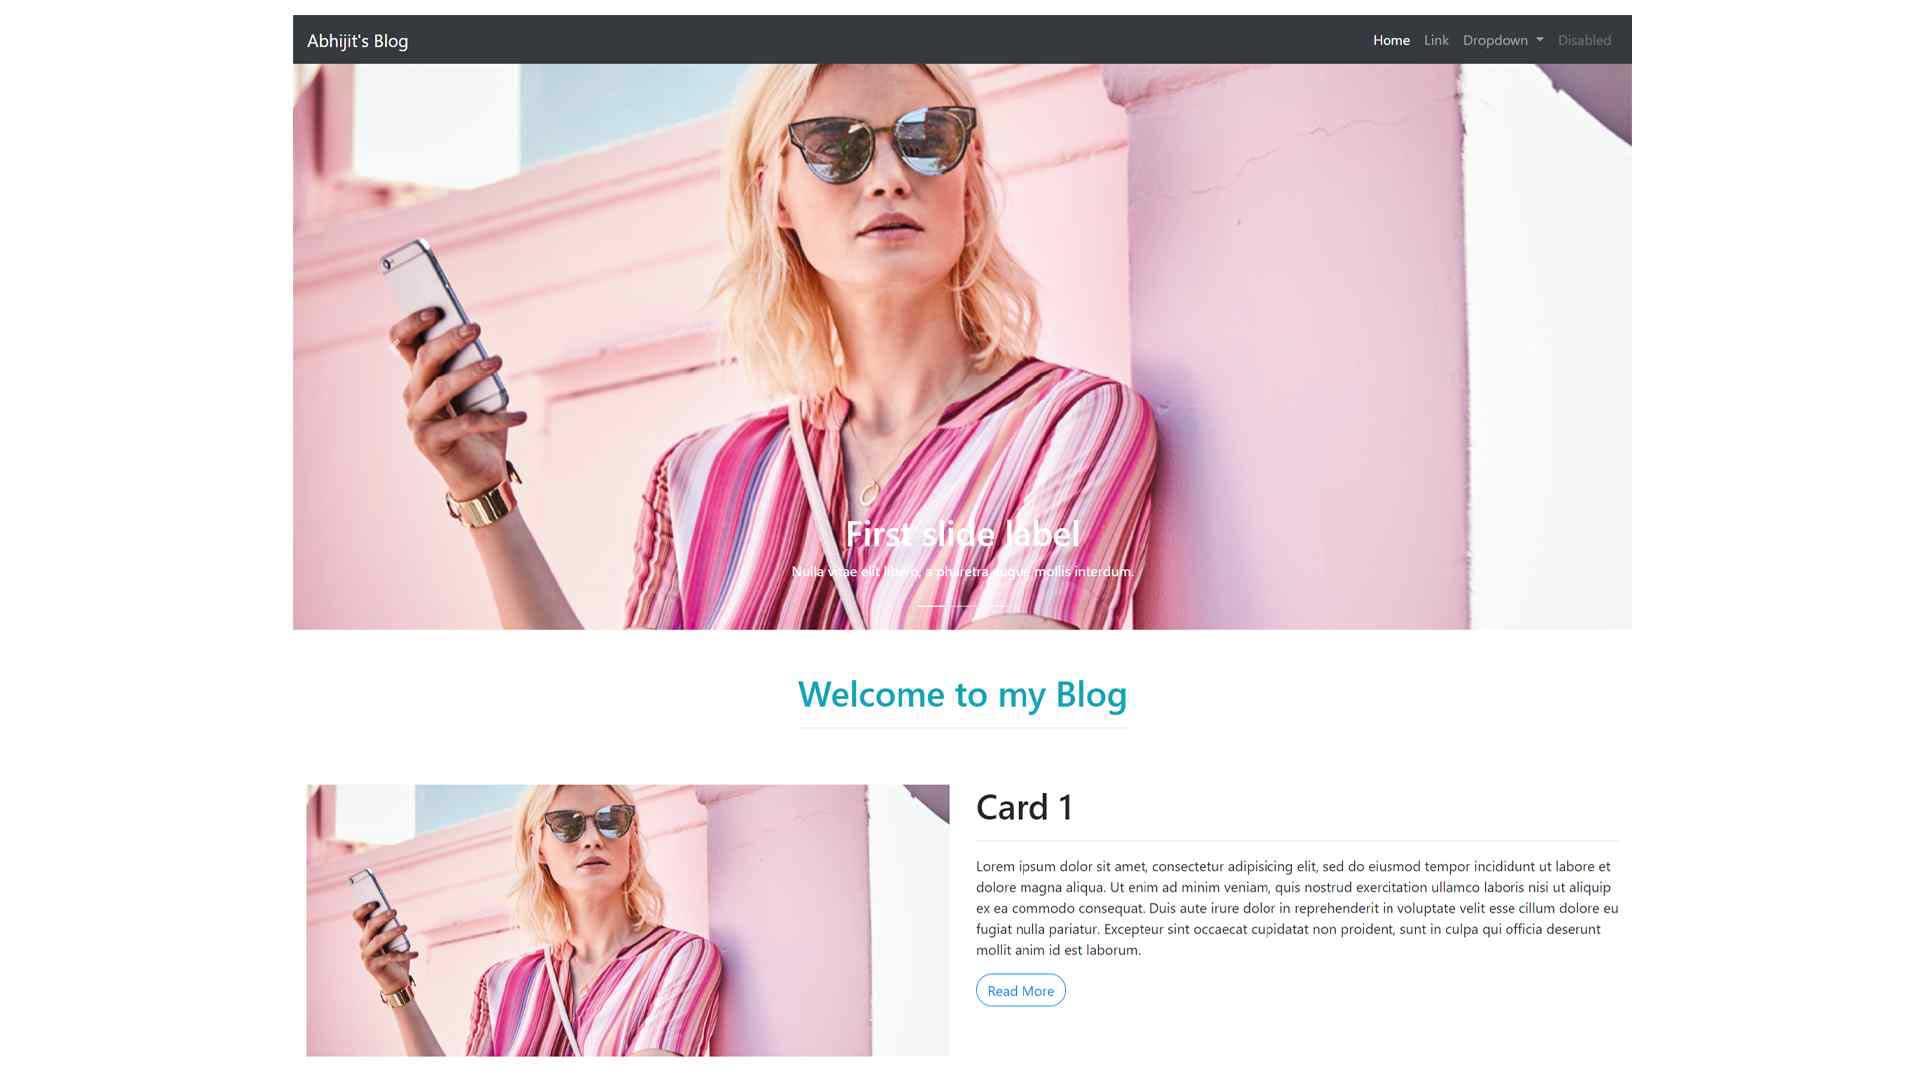 blogpost-1